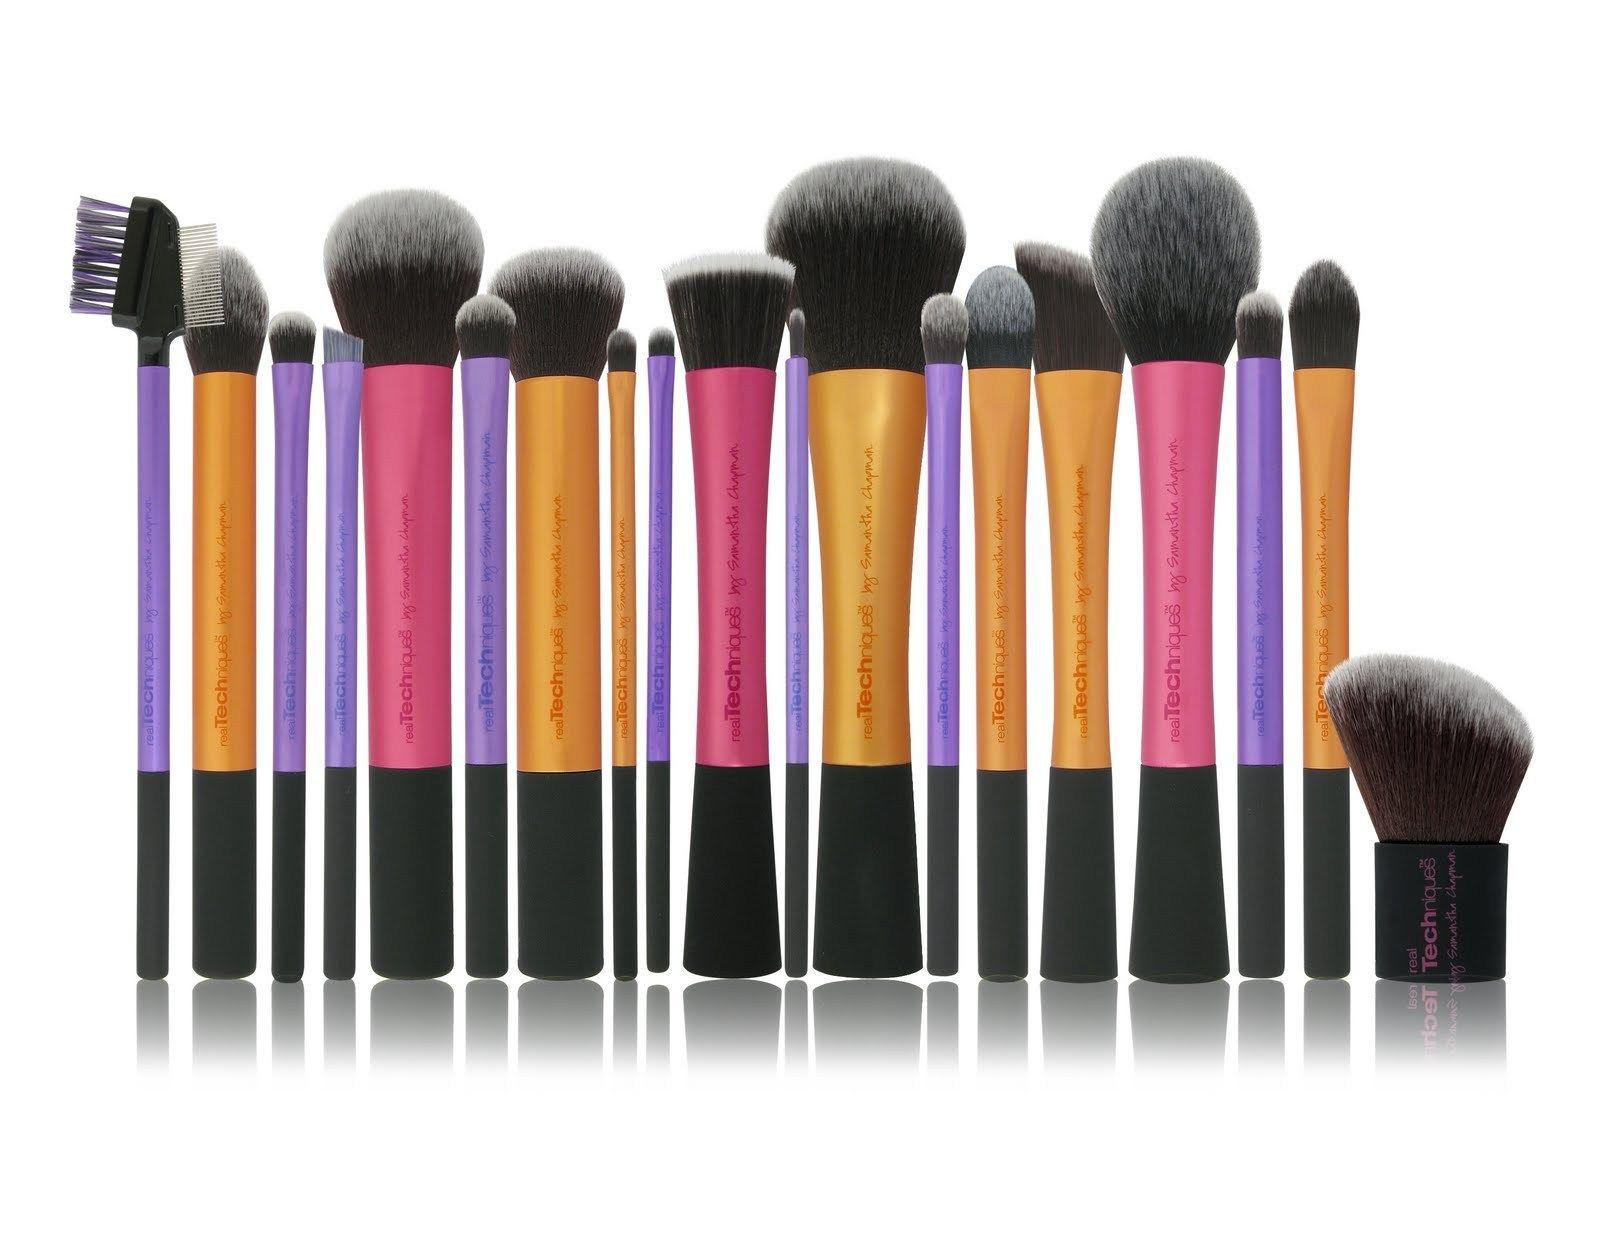 I prodotti più usati da Makeup artist e beauty guru